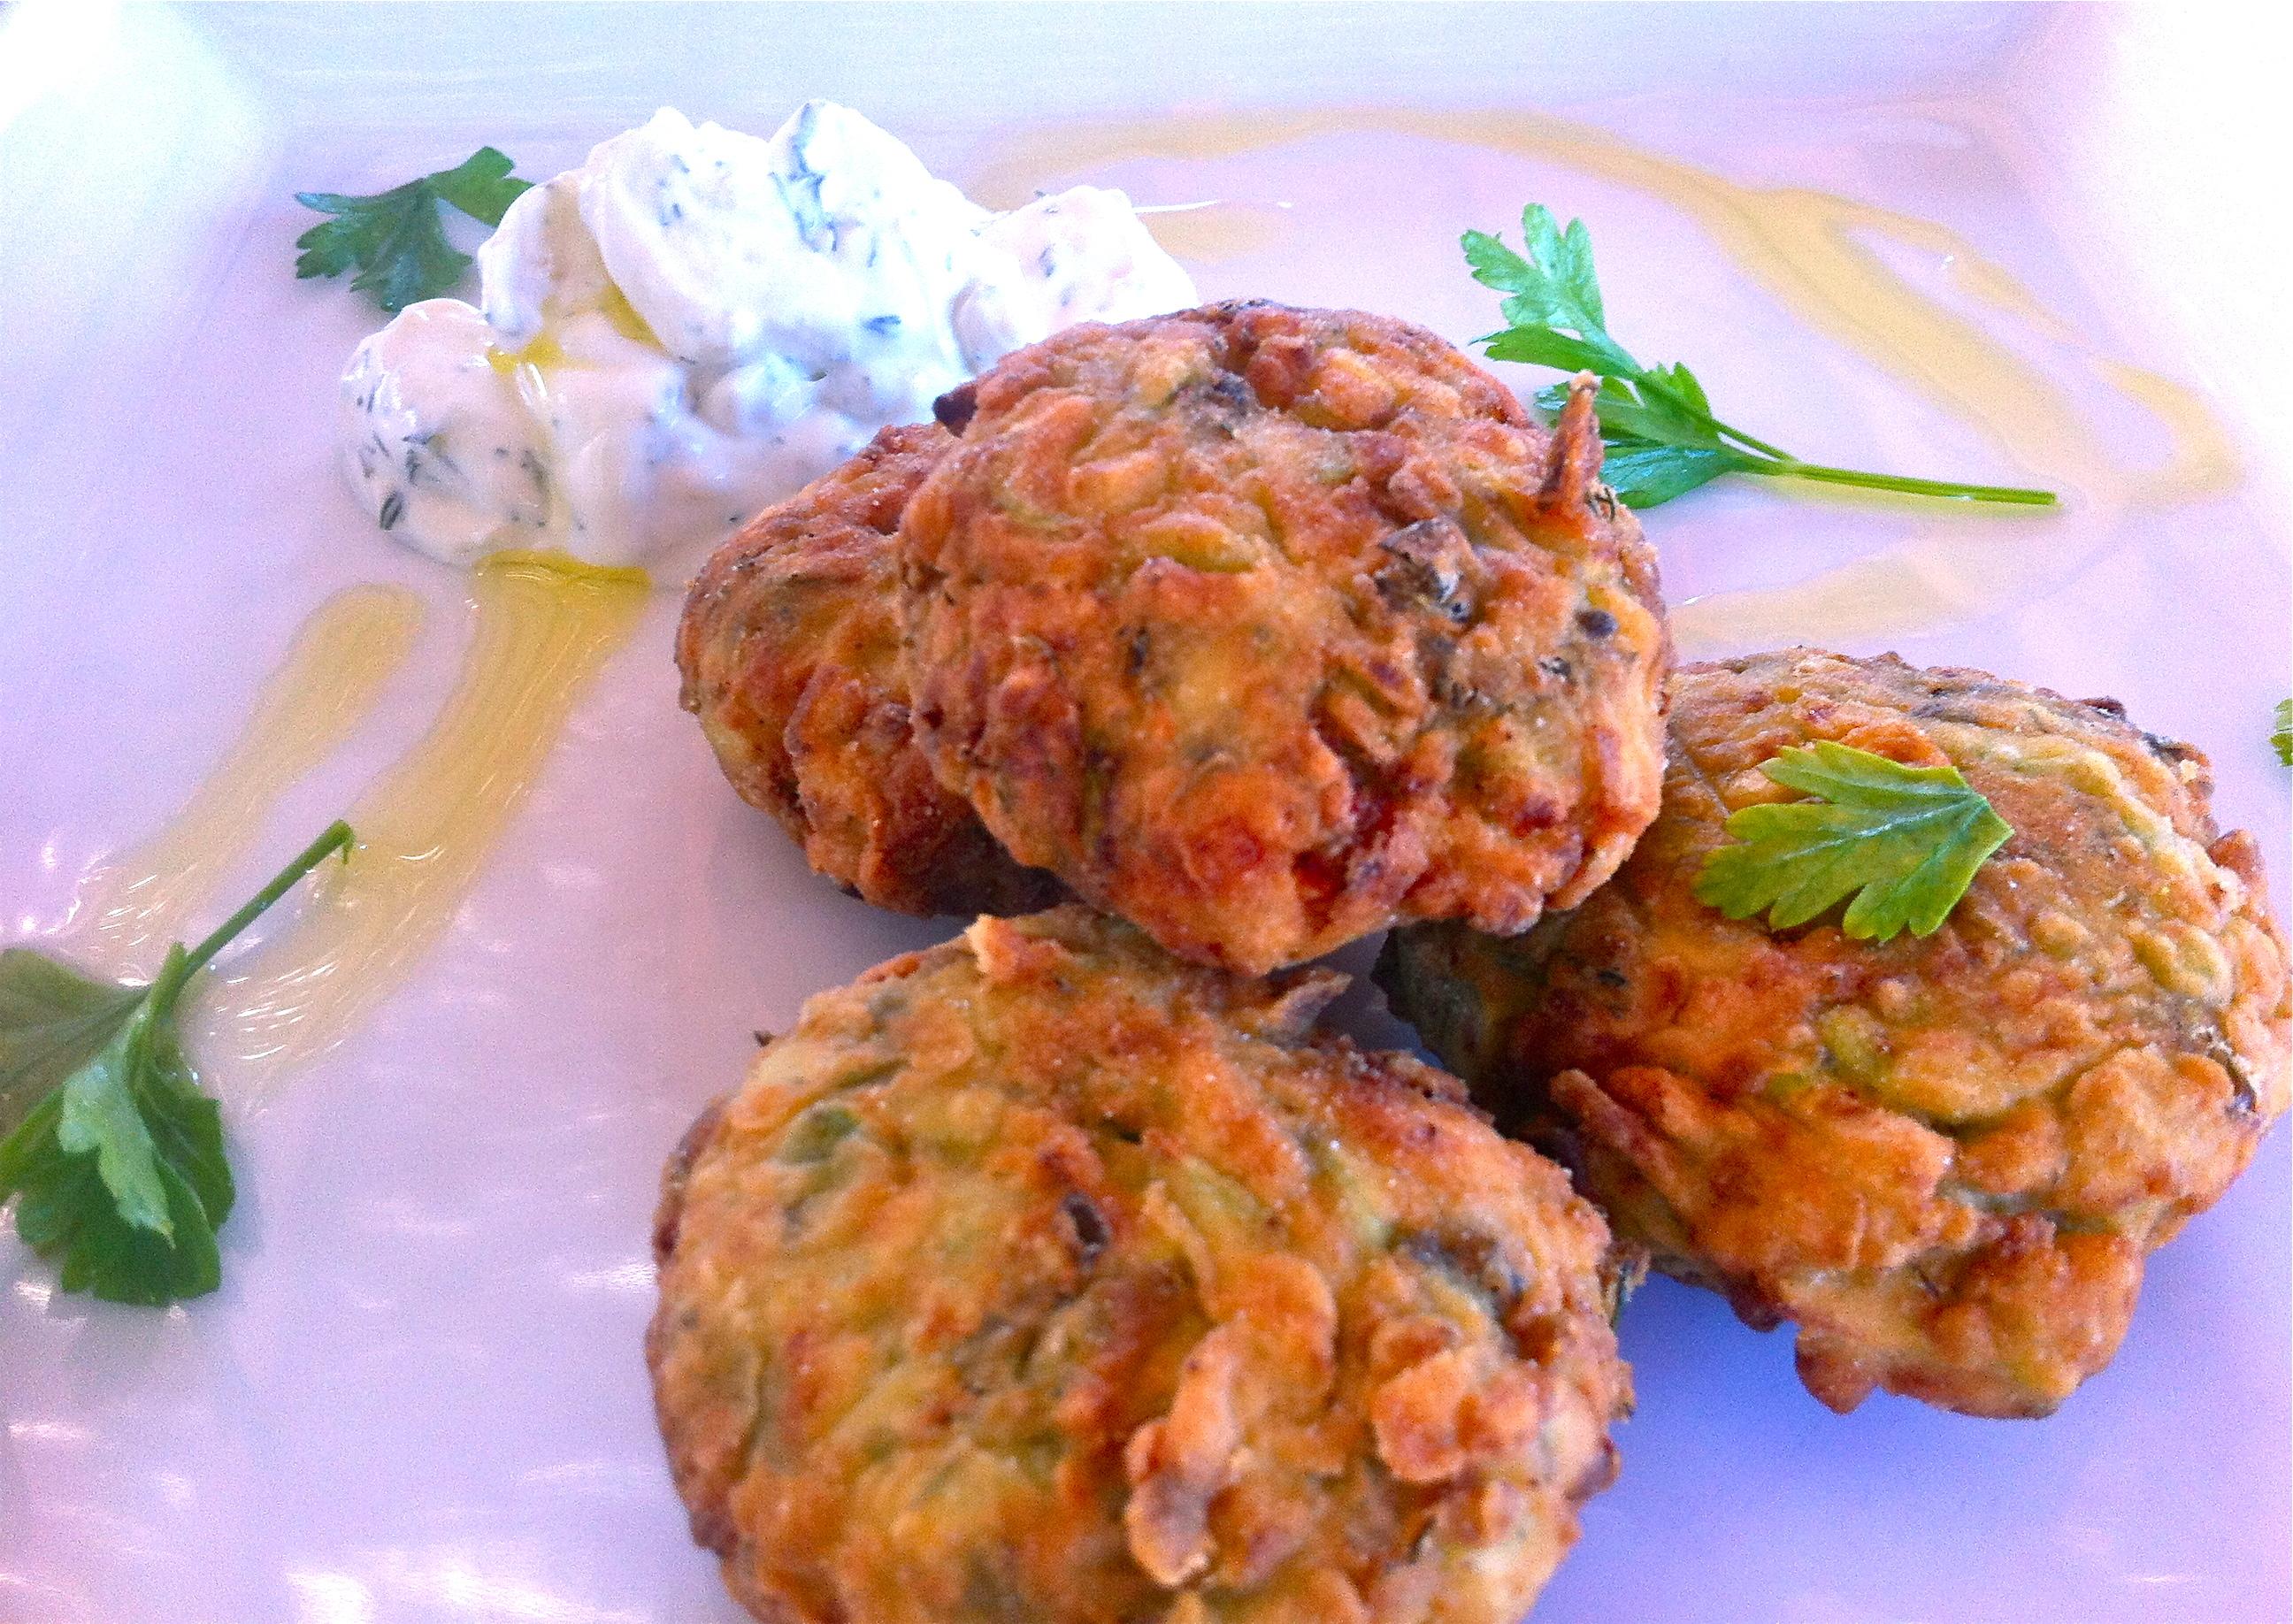 Chickpea & Shrimp fried patties